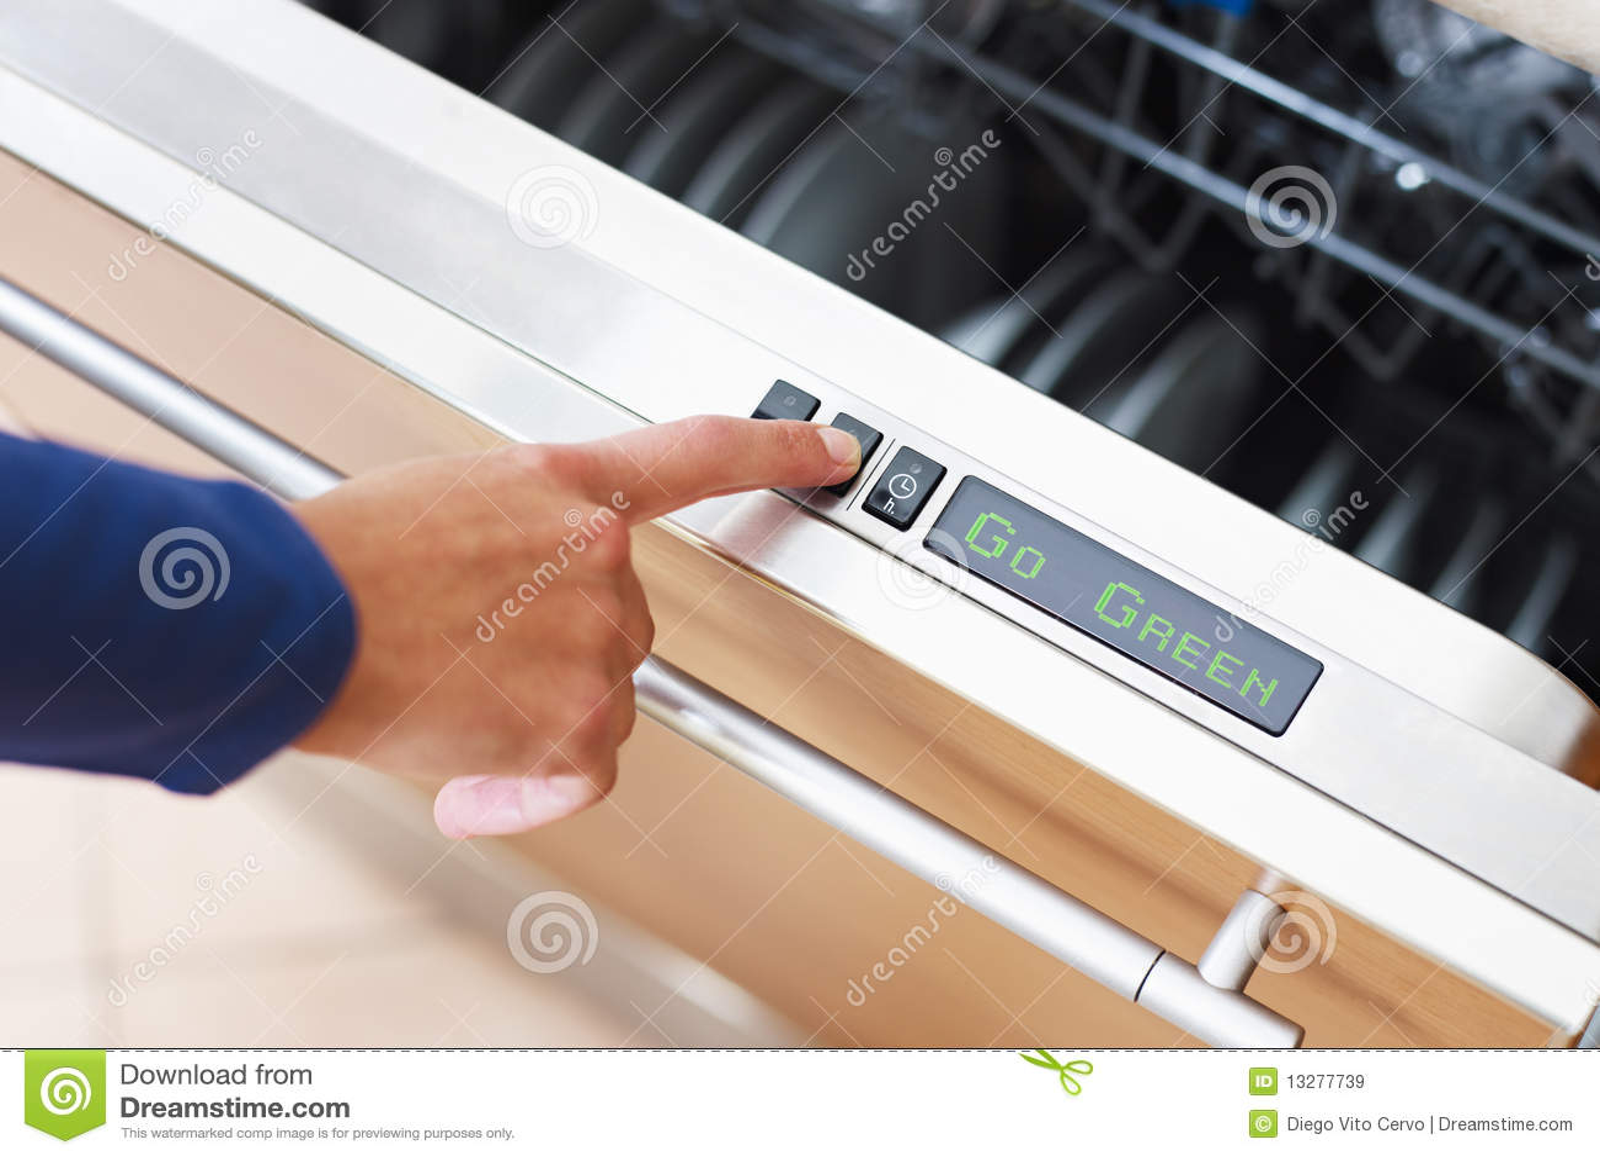 Woman pressing energy saver button on dishwasher